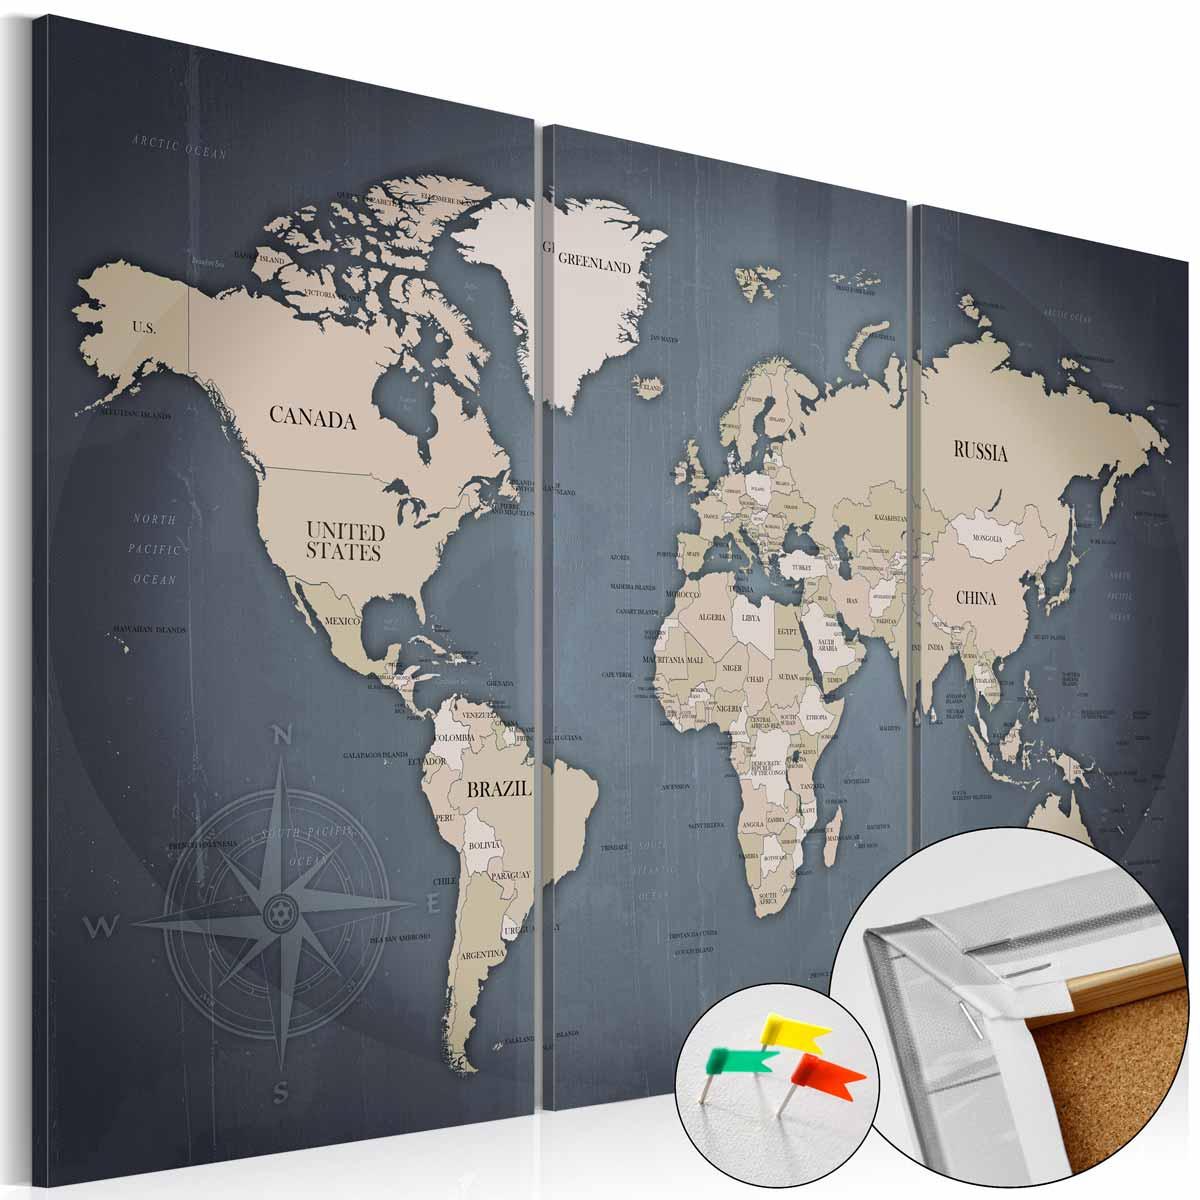 ARTGEIST Antique Travel verdenskort billede - lysebrun og gr/sort print p kork (40x60)